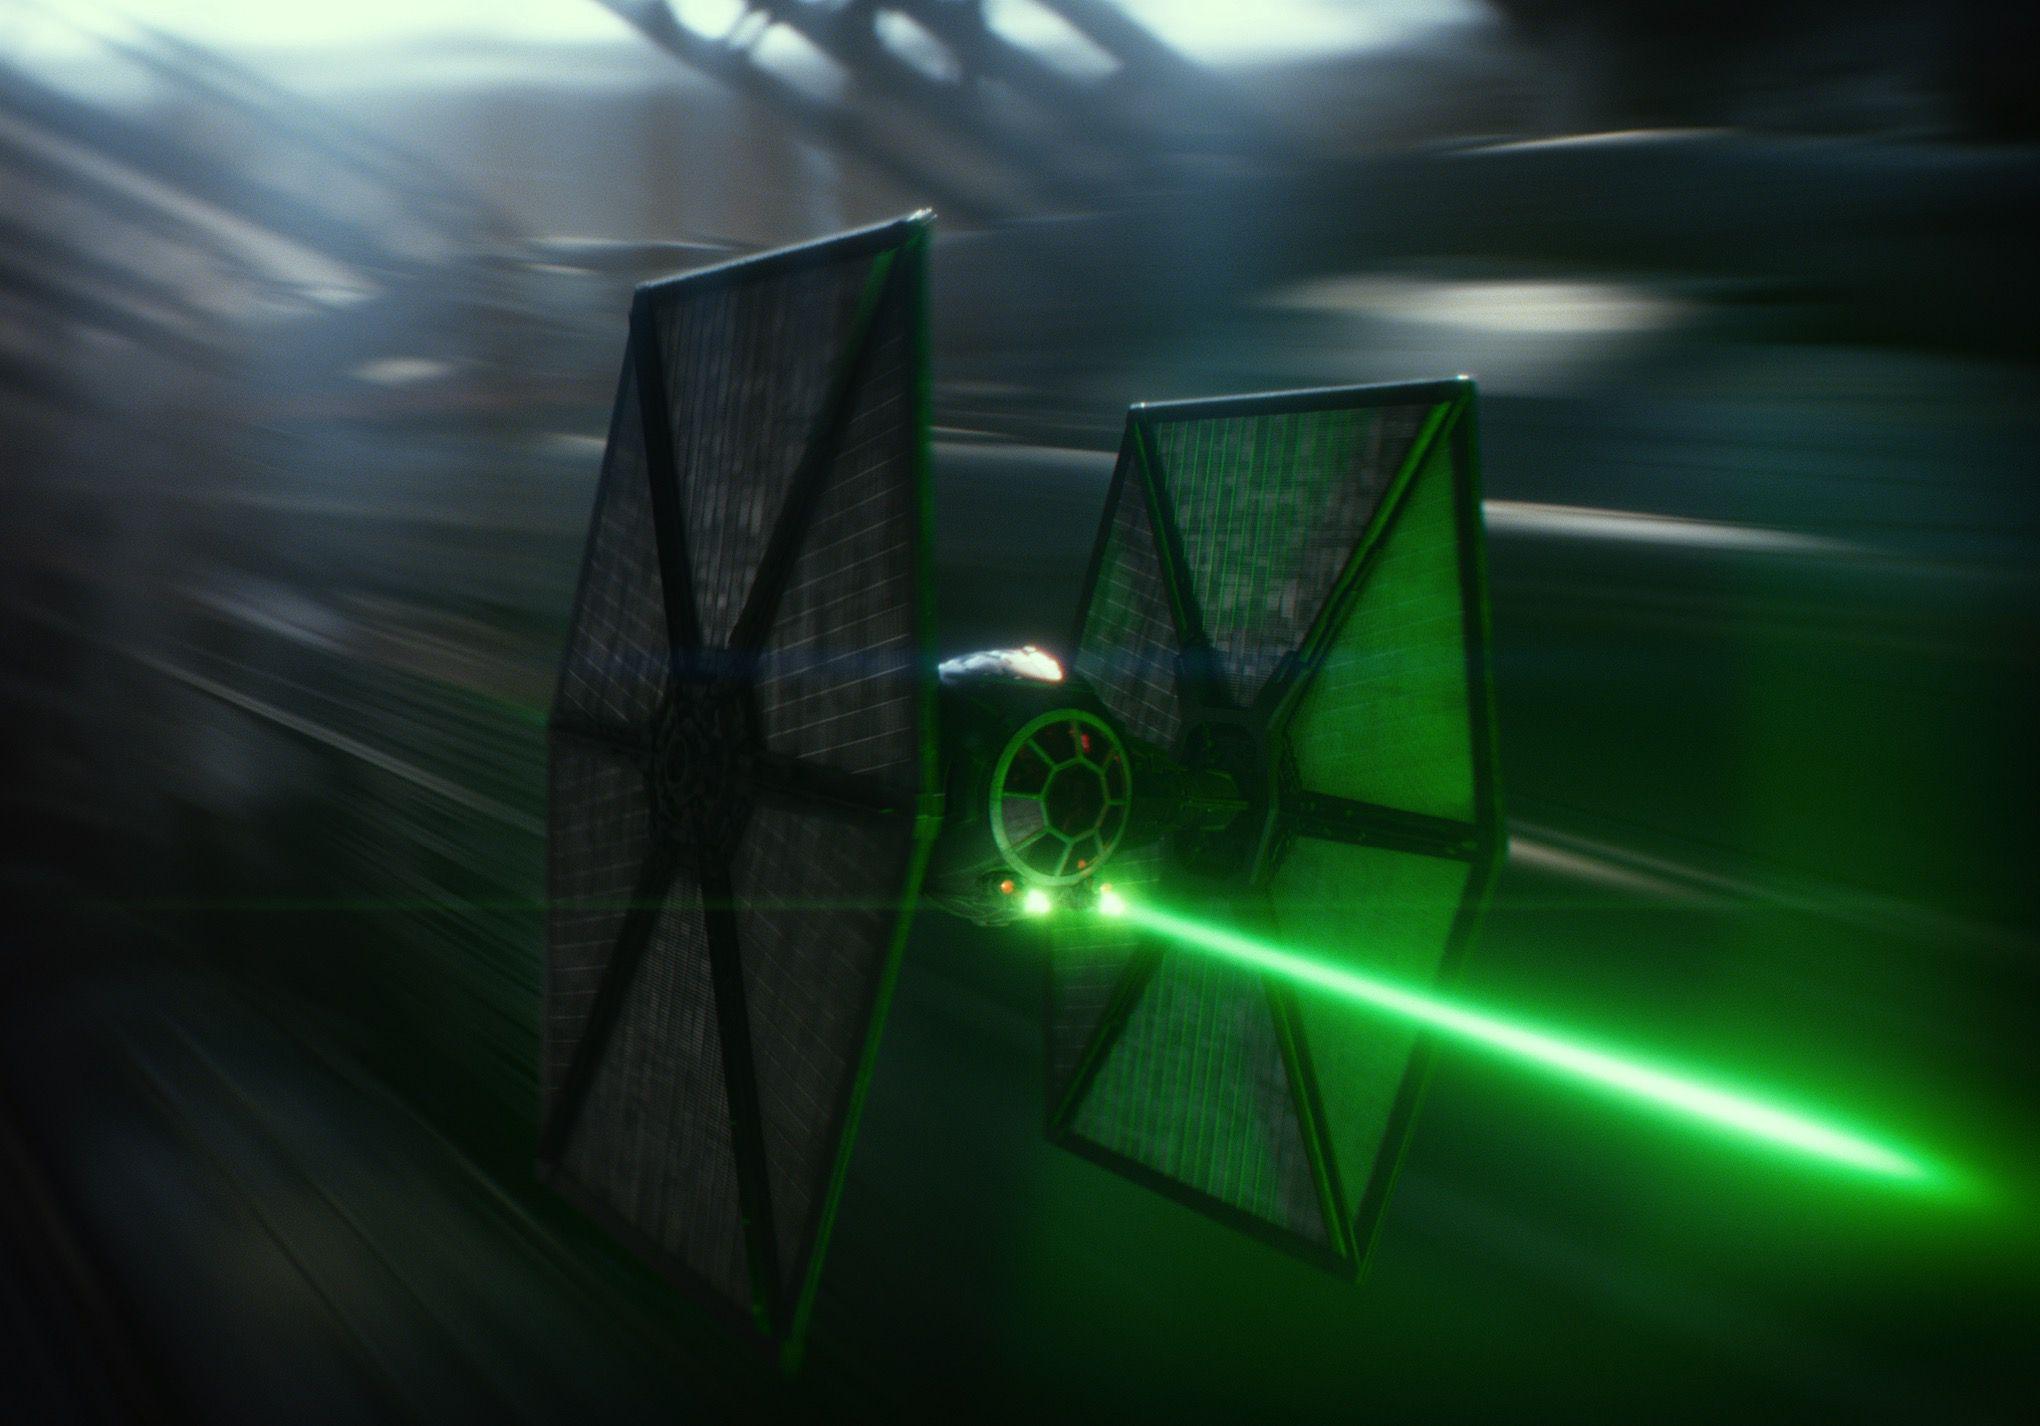 Star Wars: The Force Awakens promotional still (DISNEY/LUCASFILM)